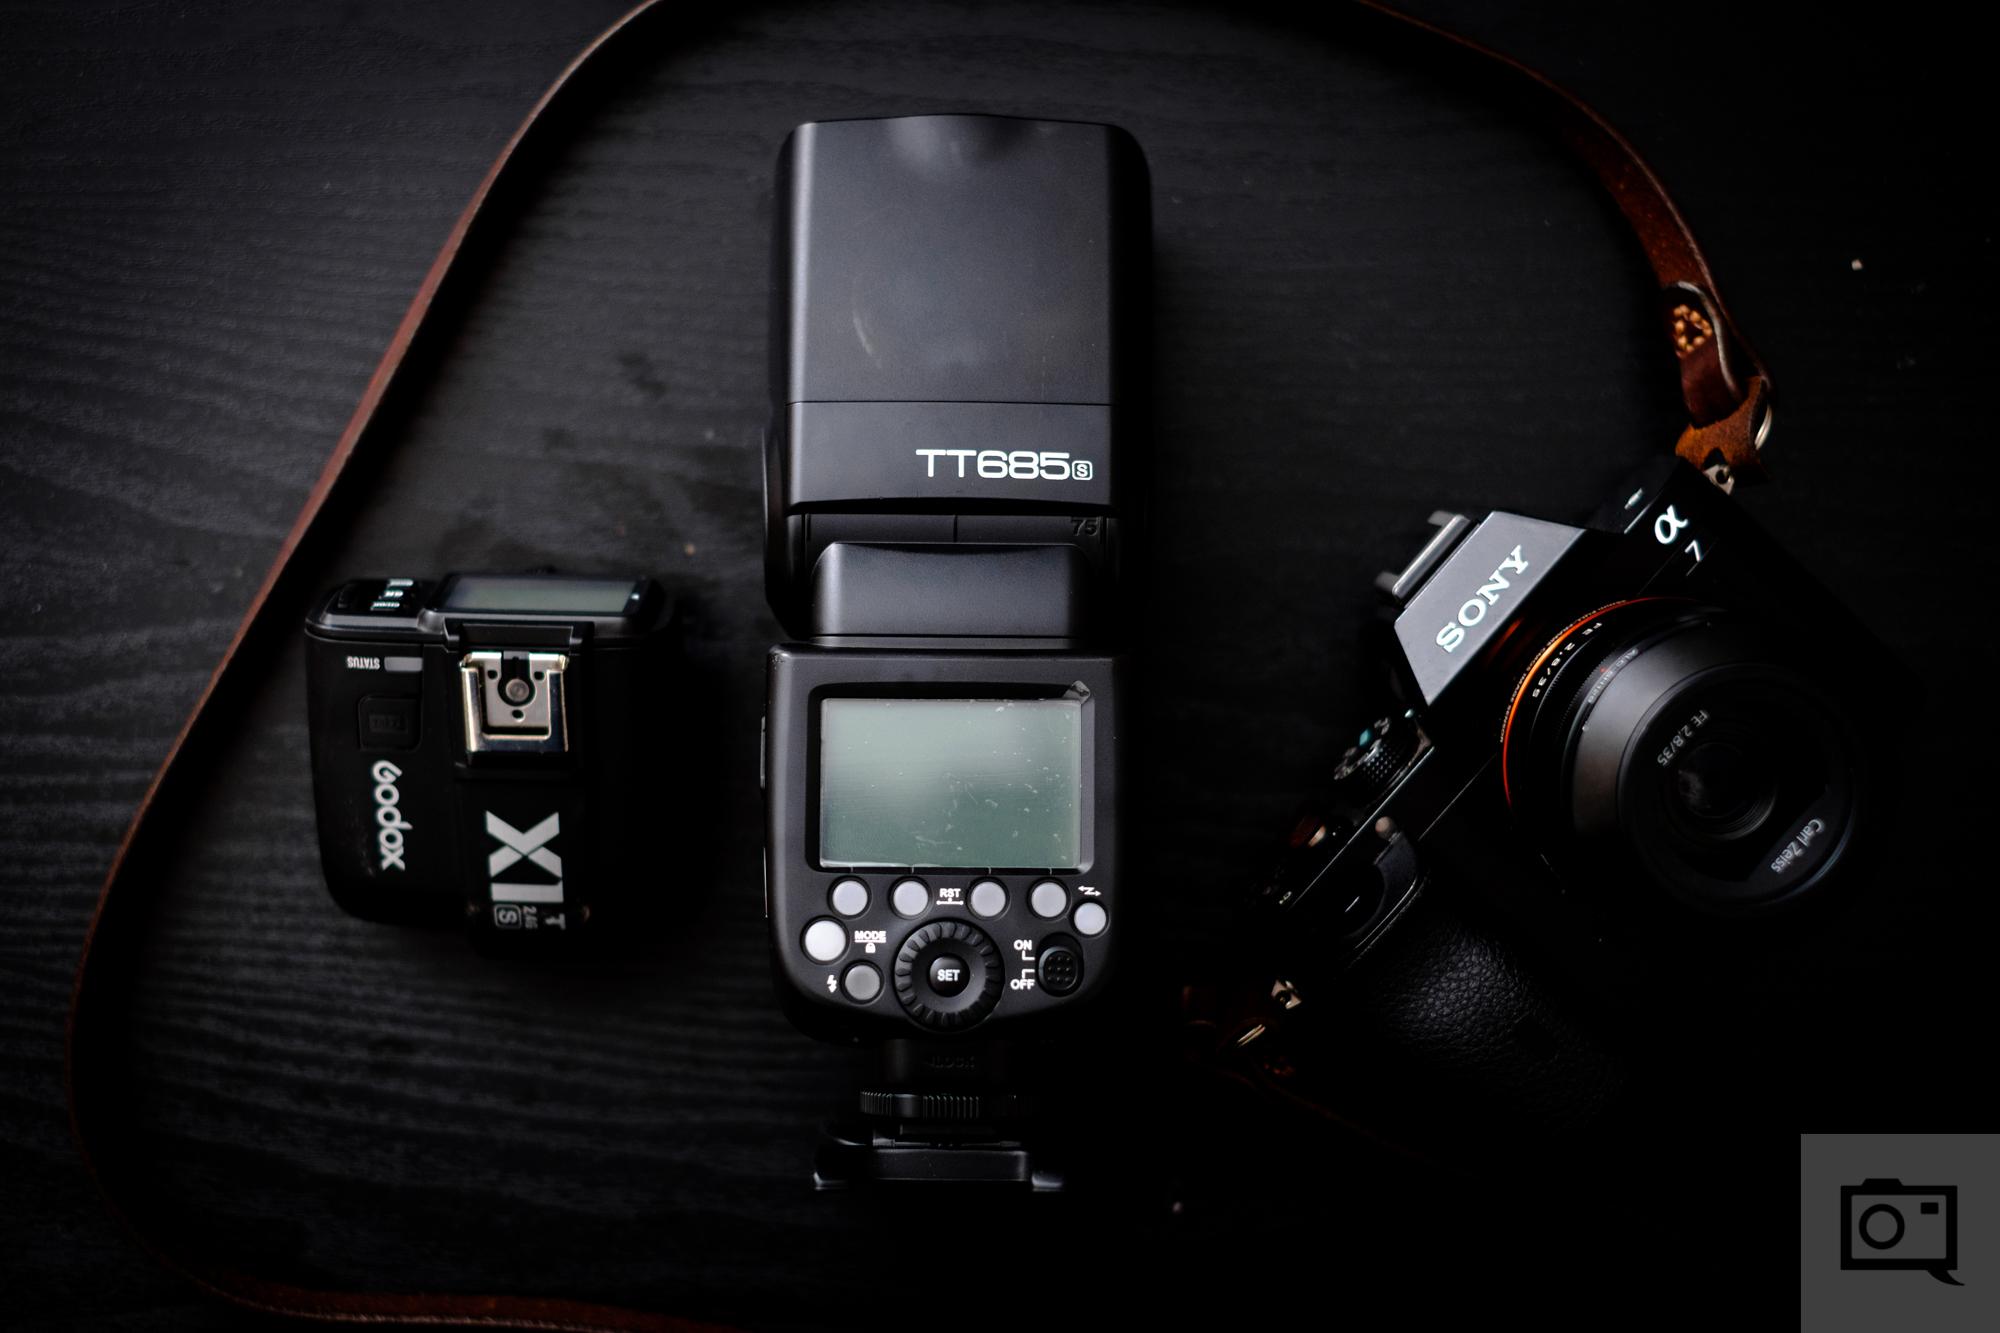 ttl or manual flash for weddings